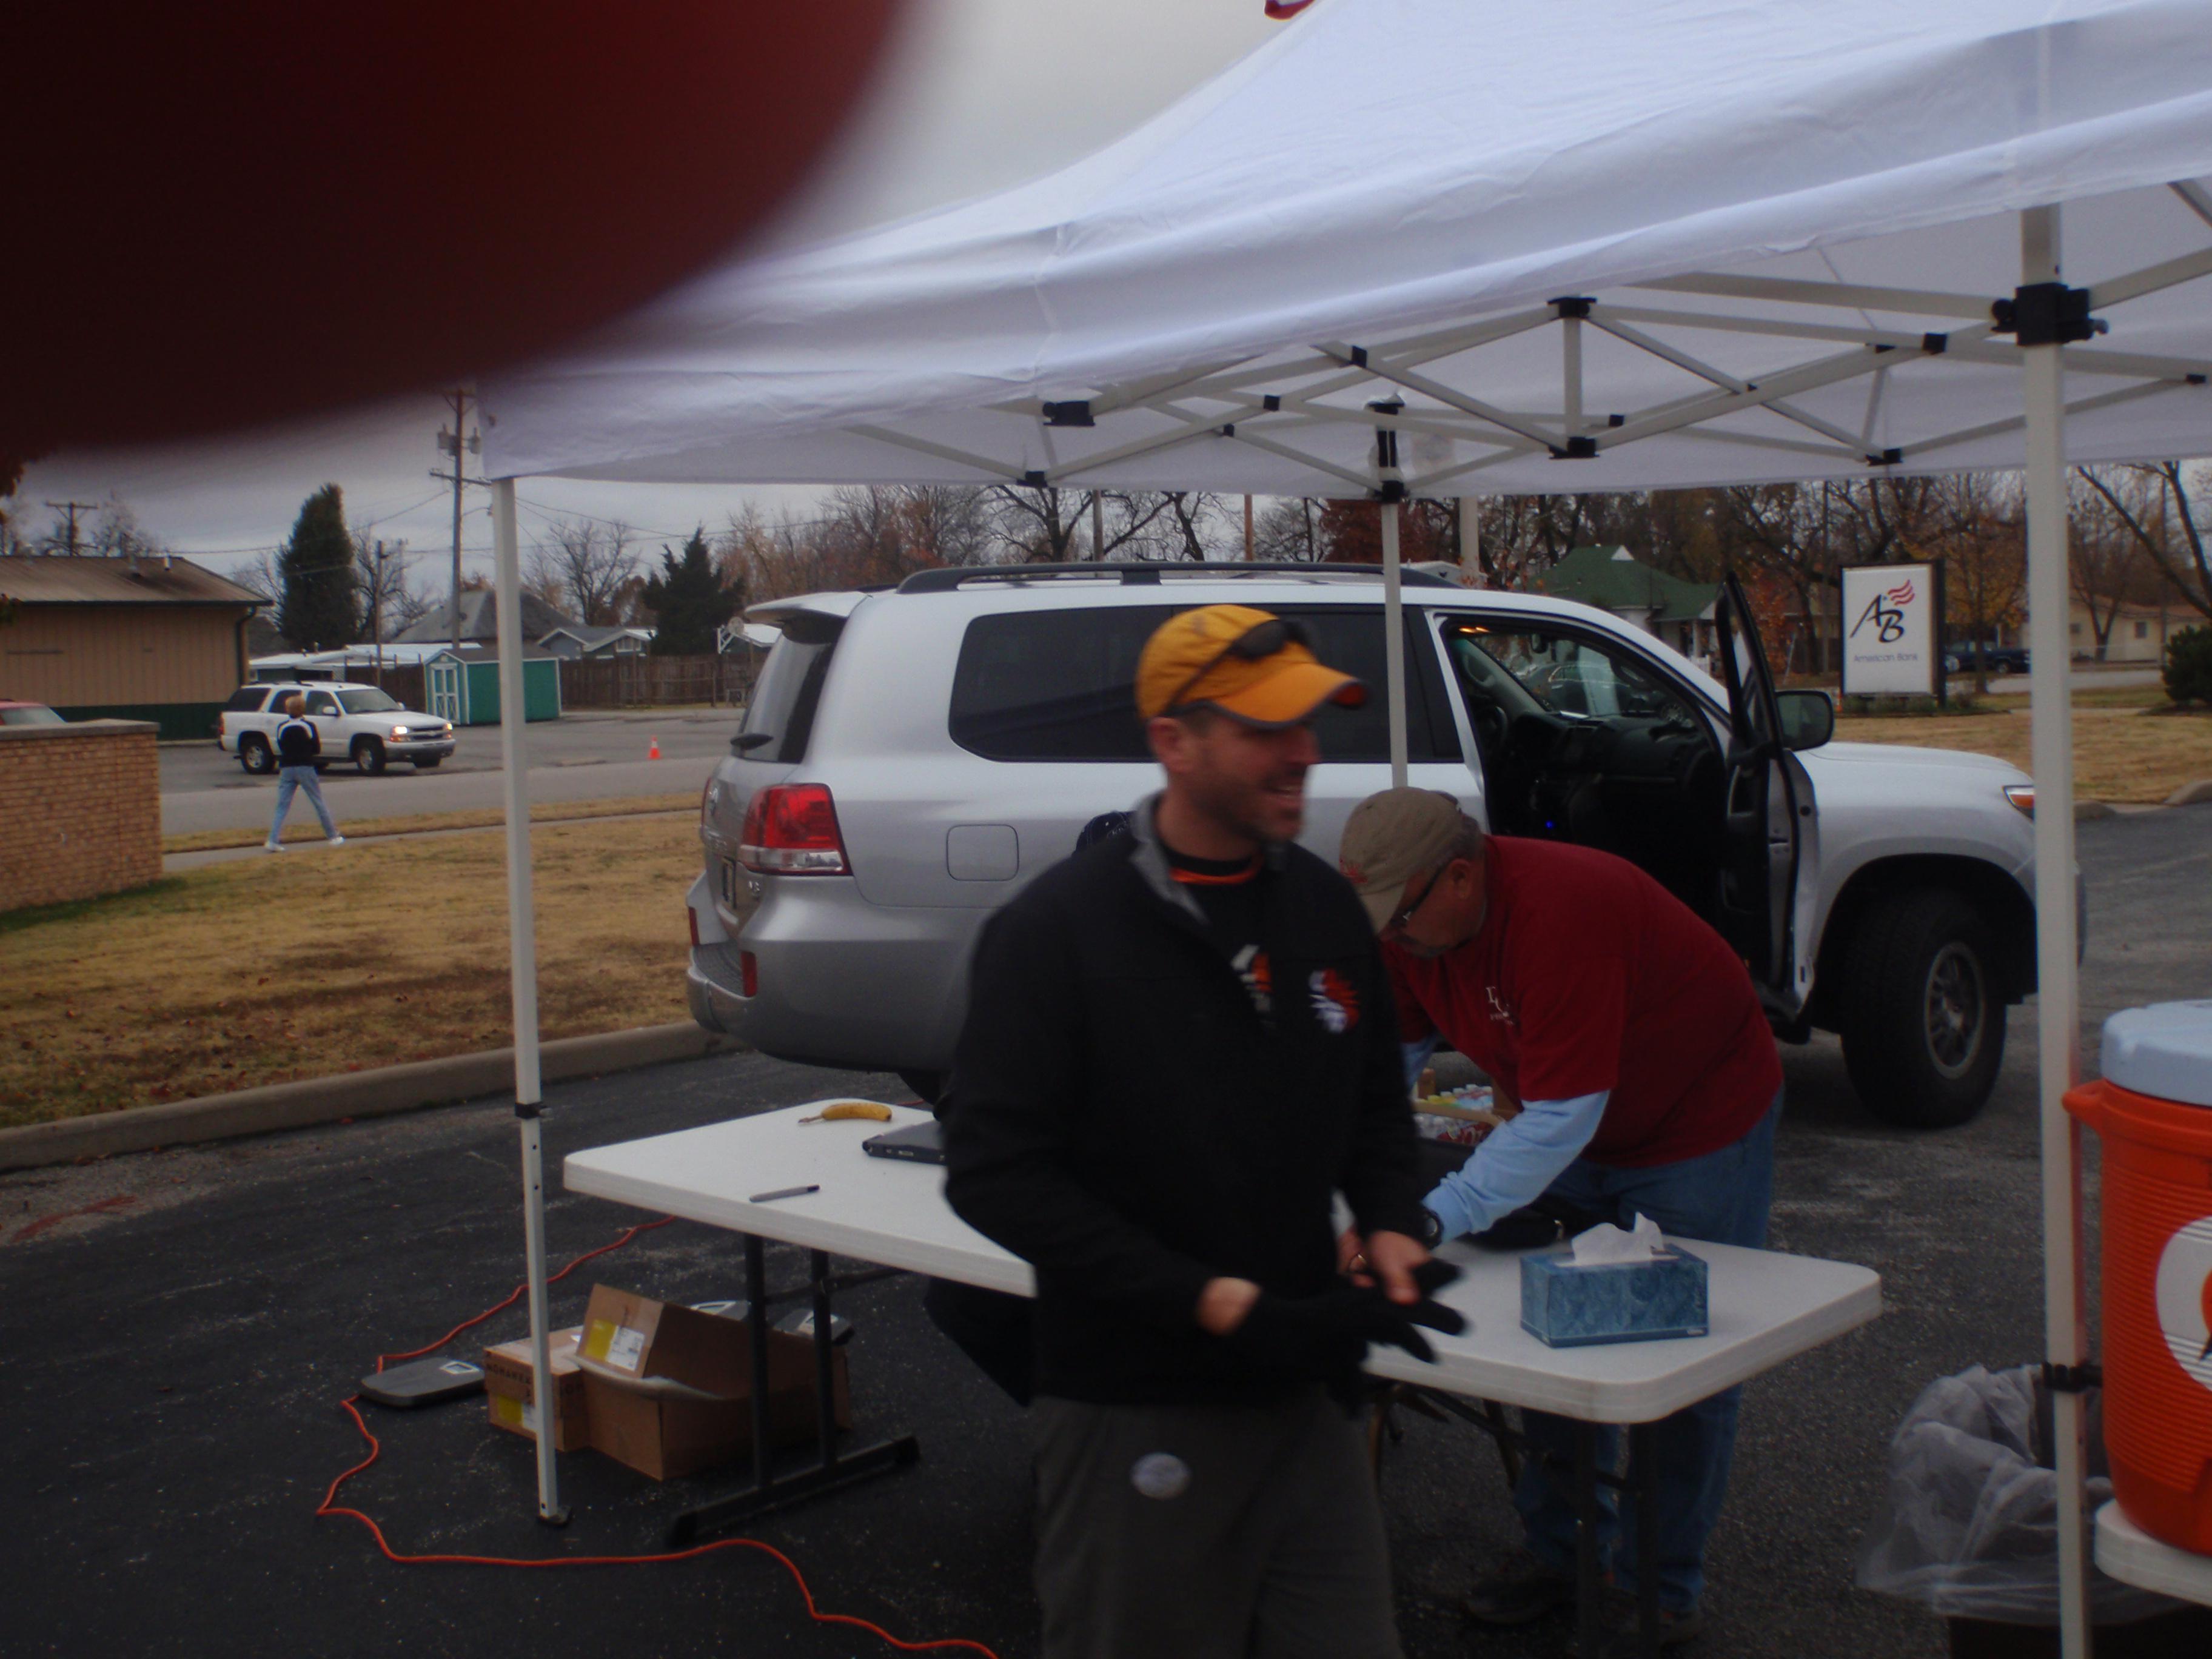 Mav managing things at pre-race registration!